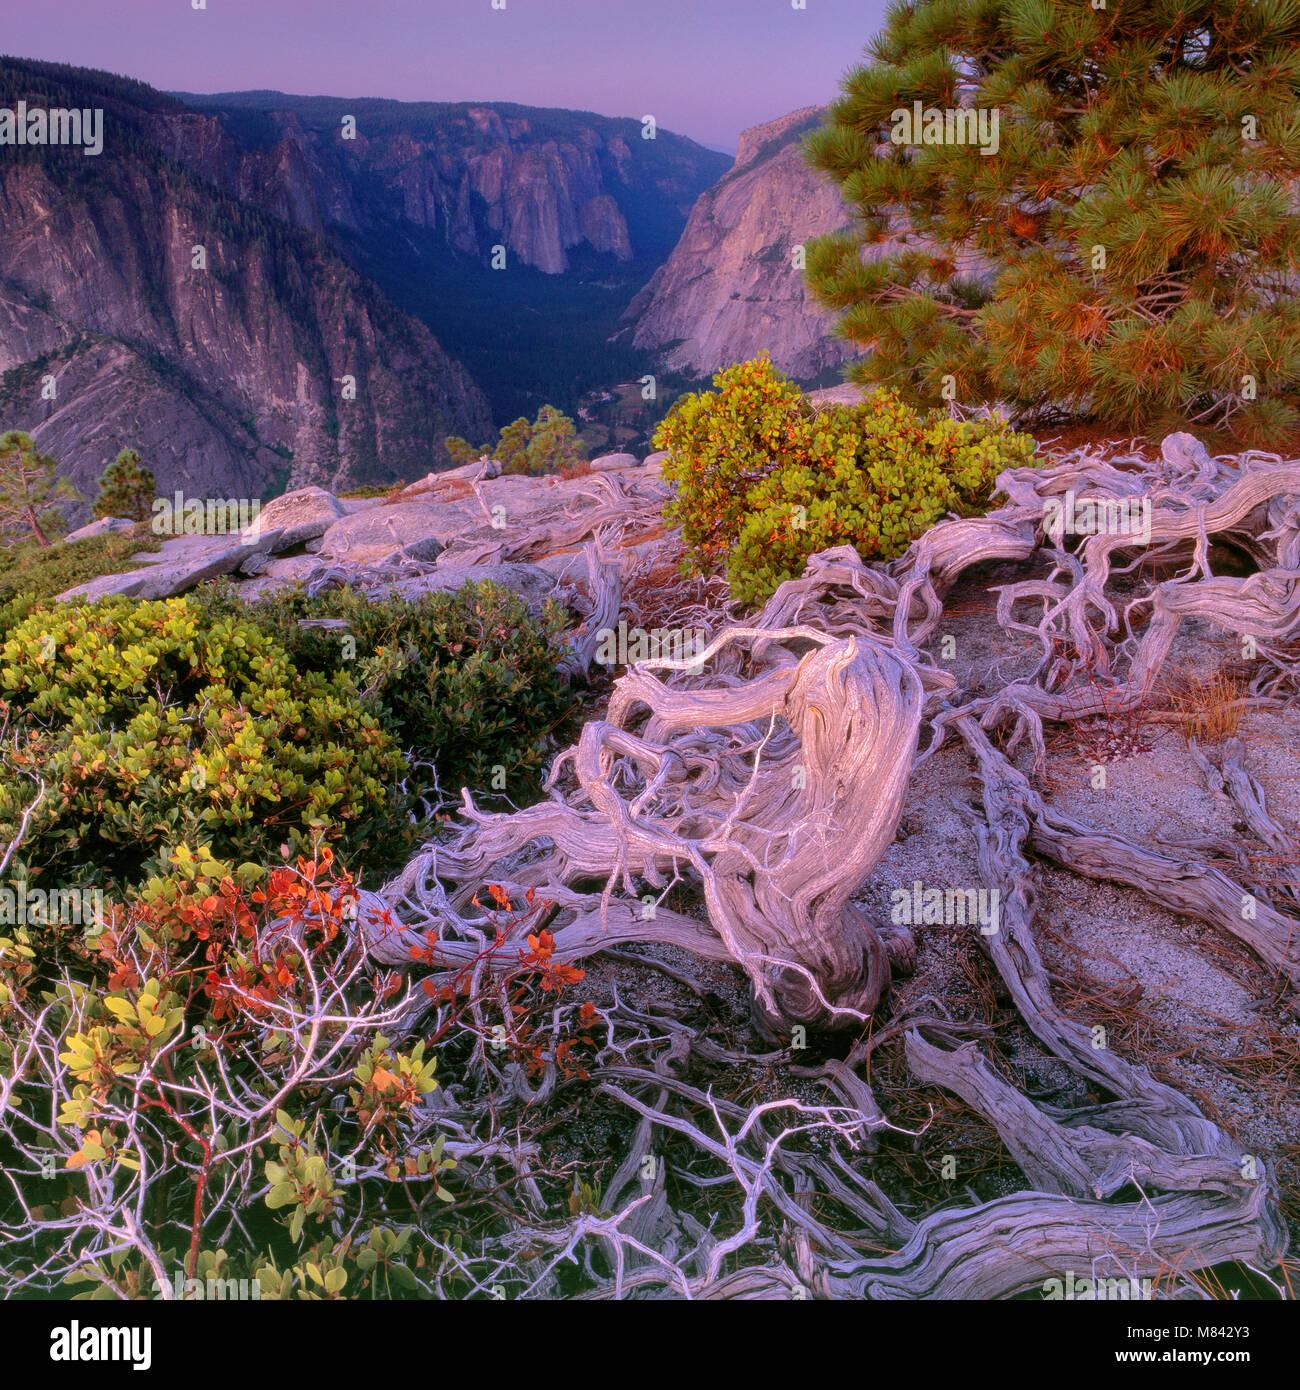 Dämmerung über Yosemite Valley, Yosemite National Park, Kalifornien Stockbild